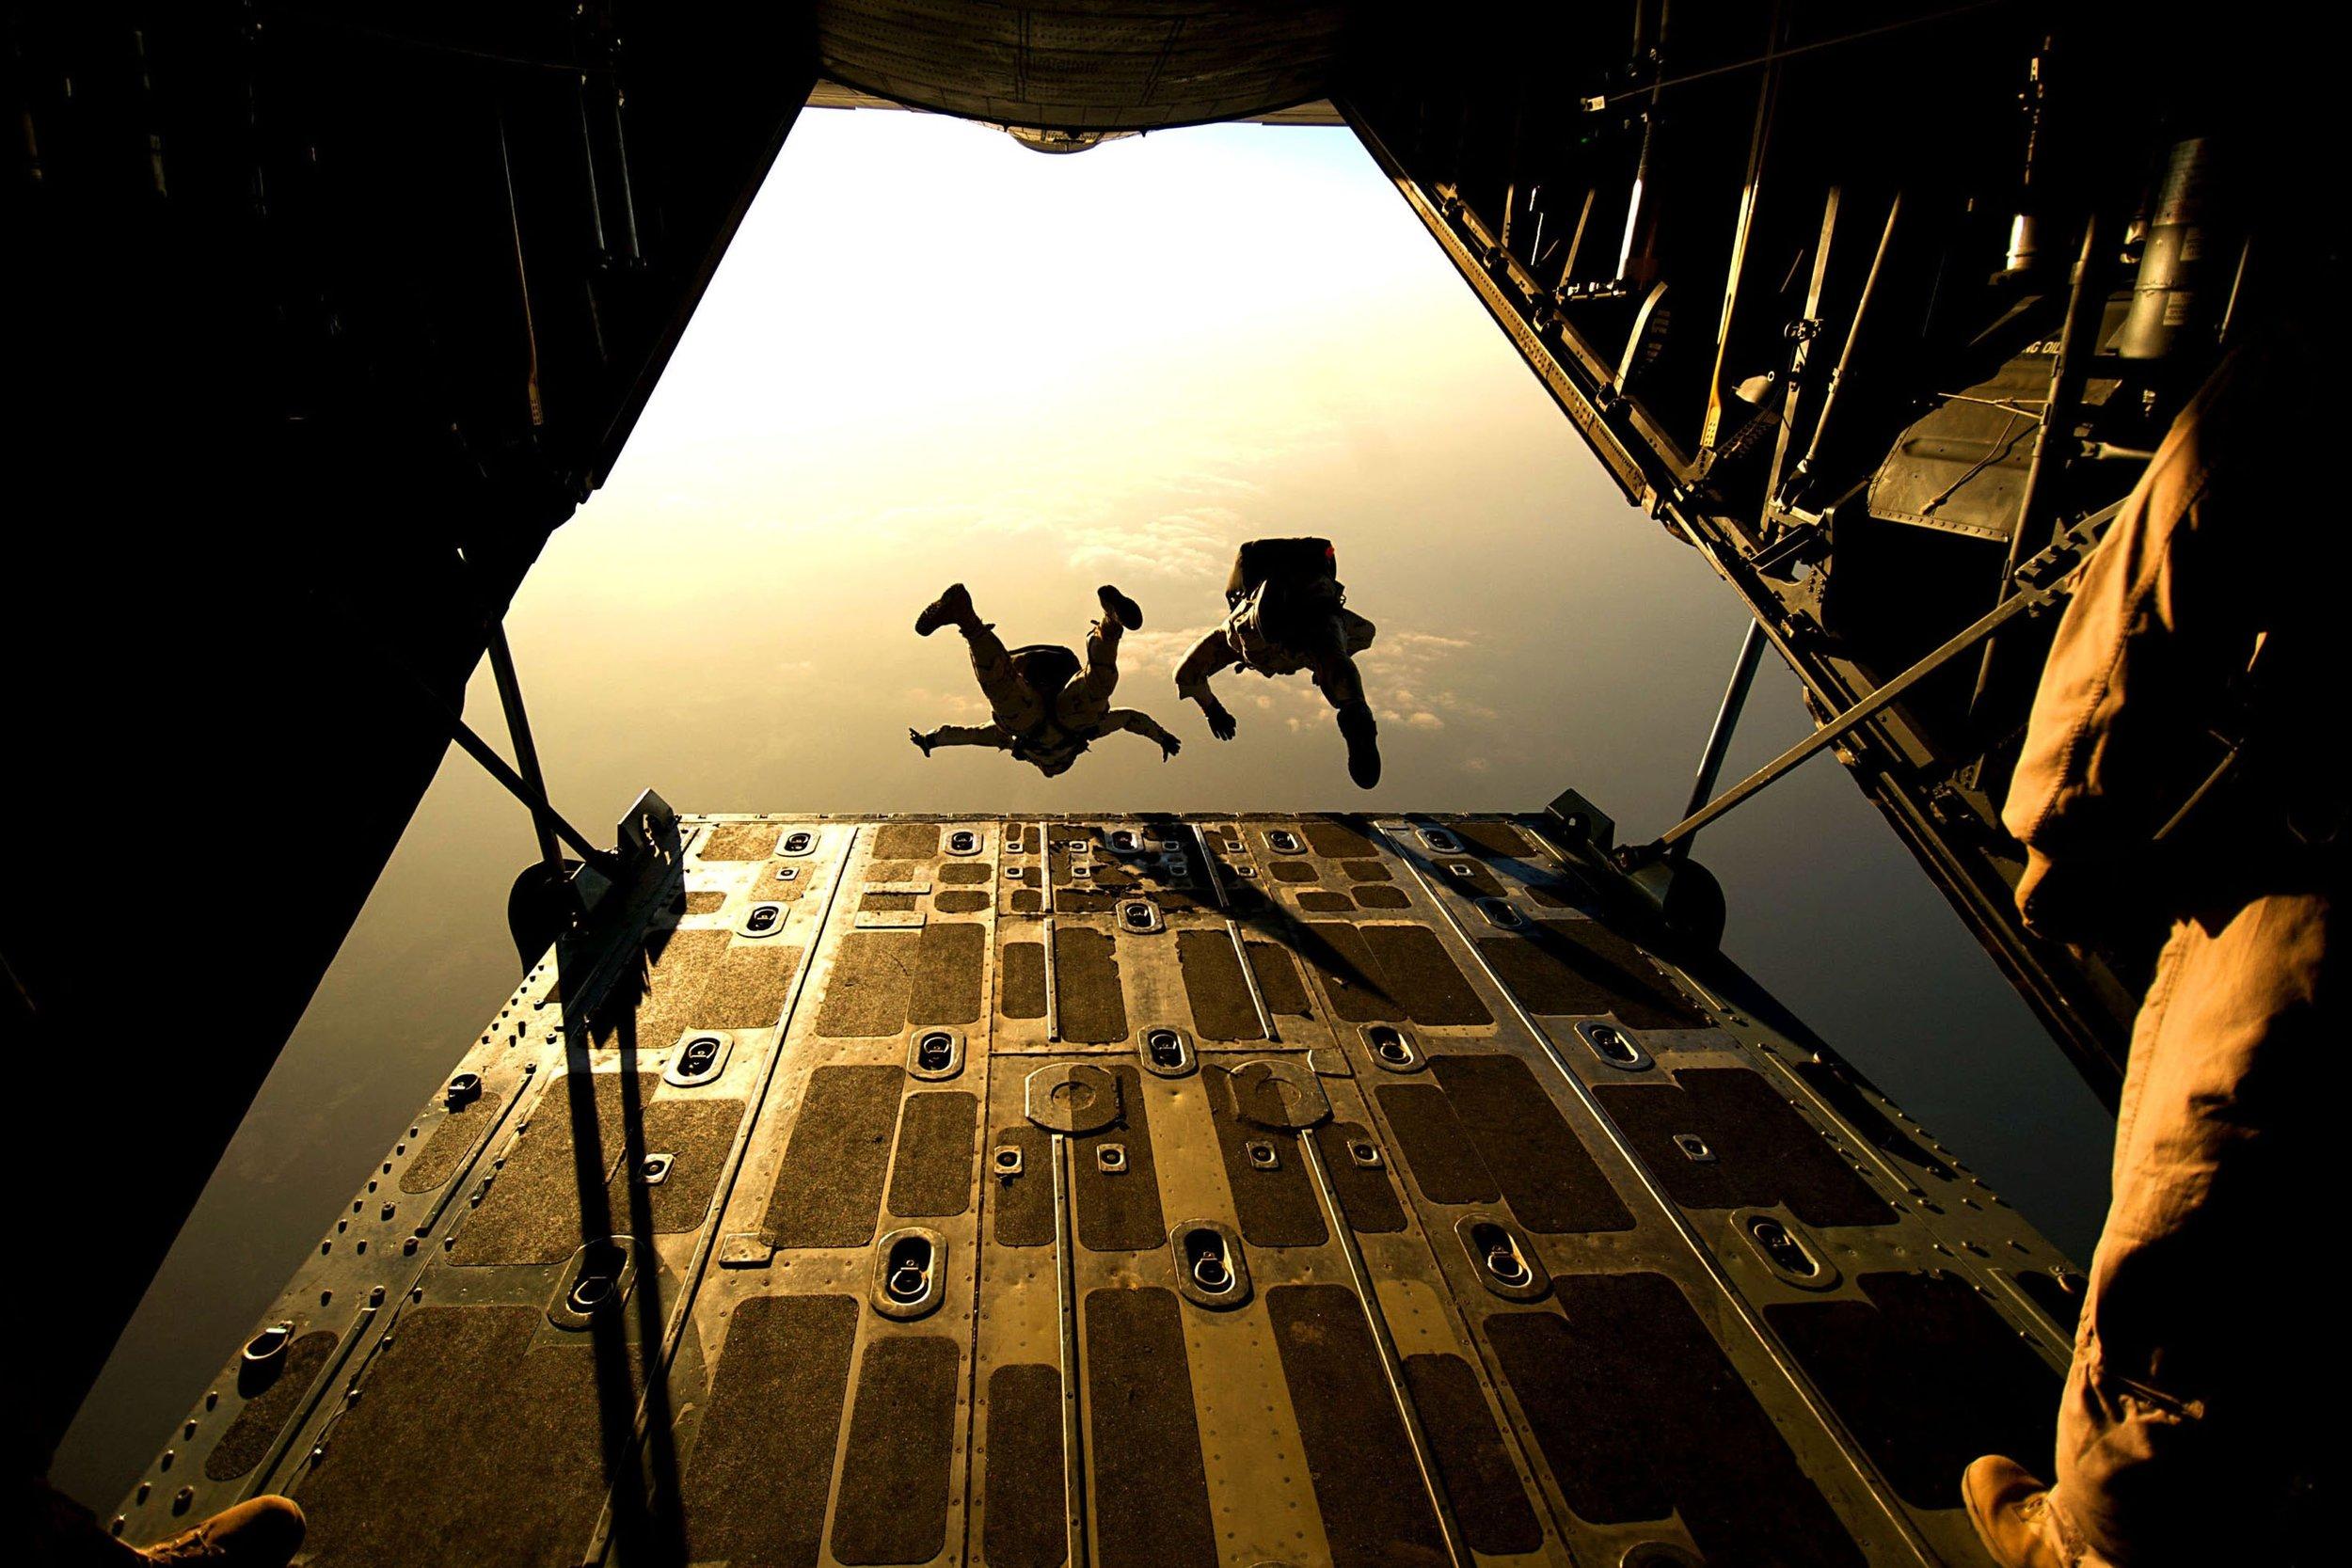 cargo-door-free-fall-parachuting-38447.jpg